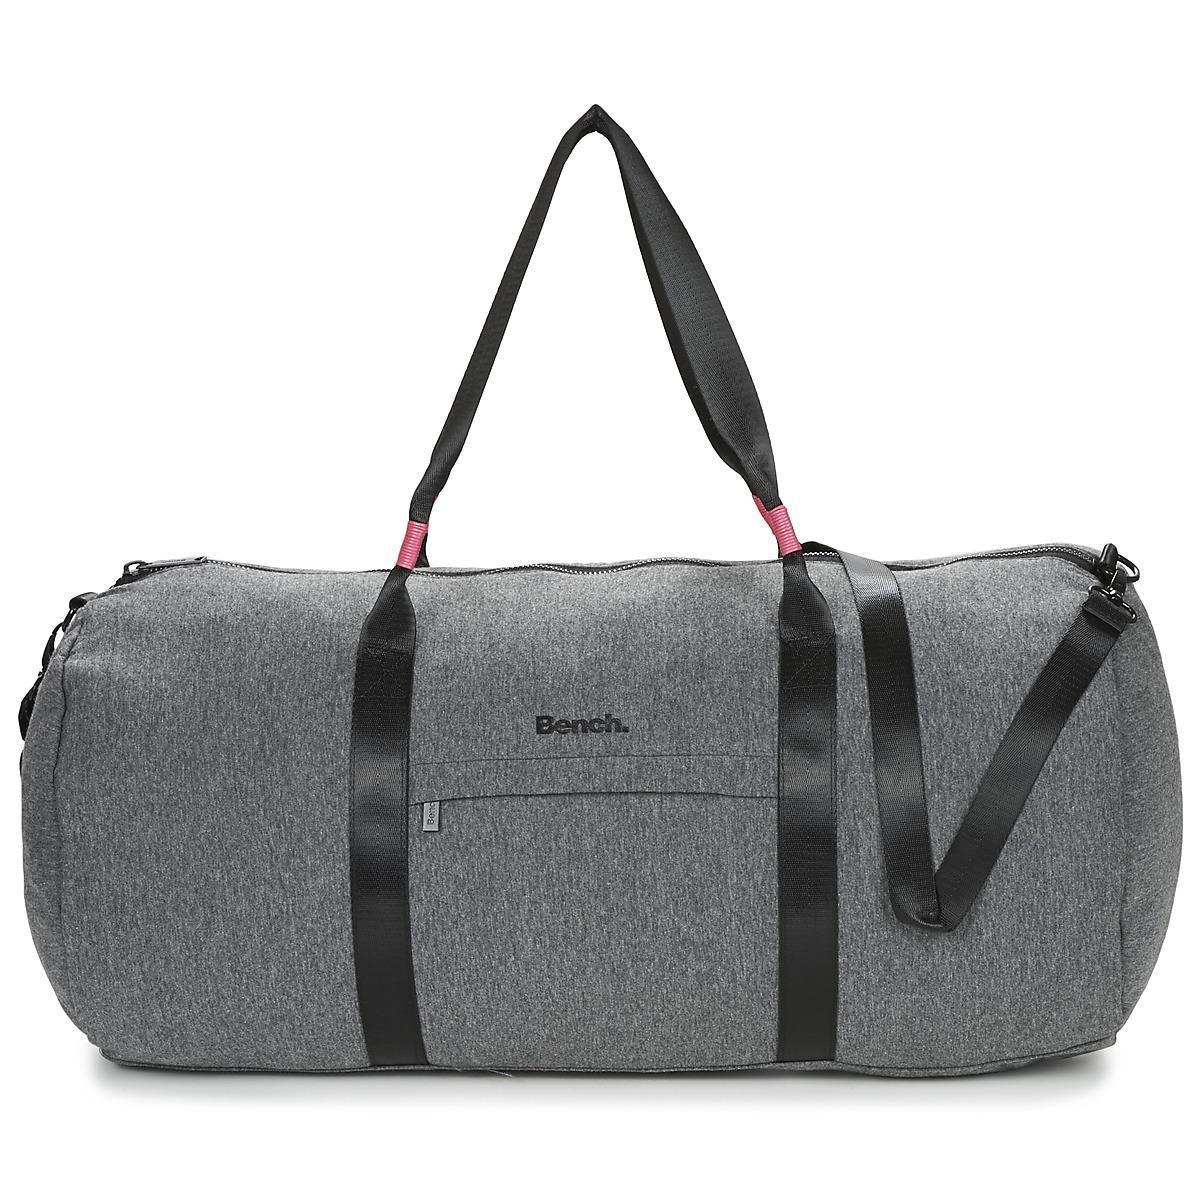 5cb53cc8ec Bench Jerszy Gym Bag Men s Sports Bag In Grey in Gray for Men - Lyst